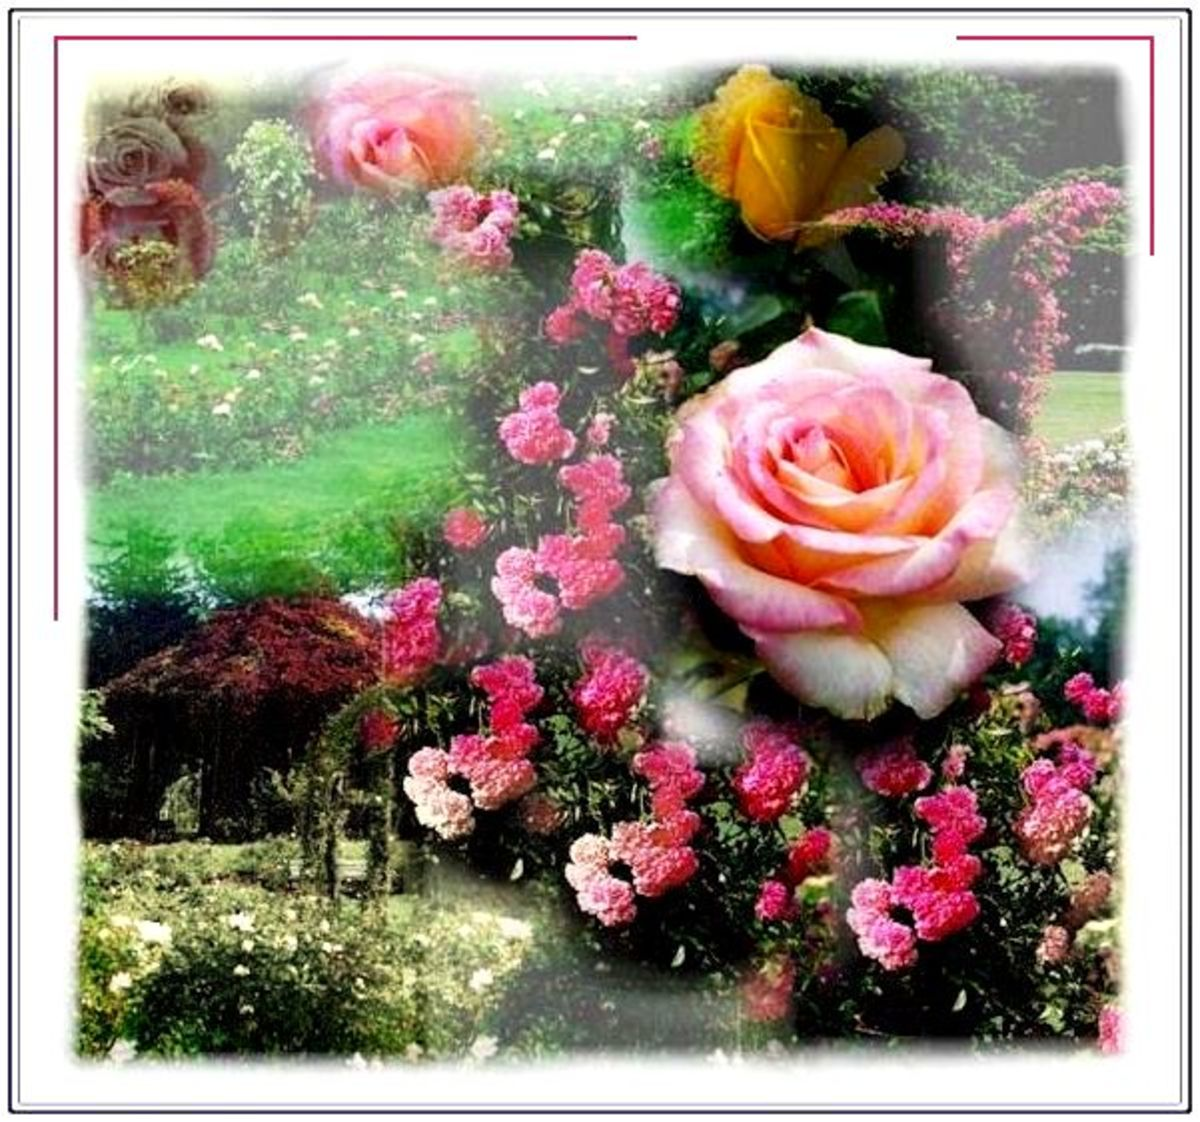 abraham-darby-a-david-austin-english-rose